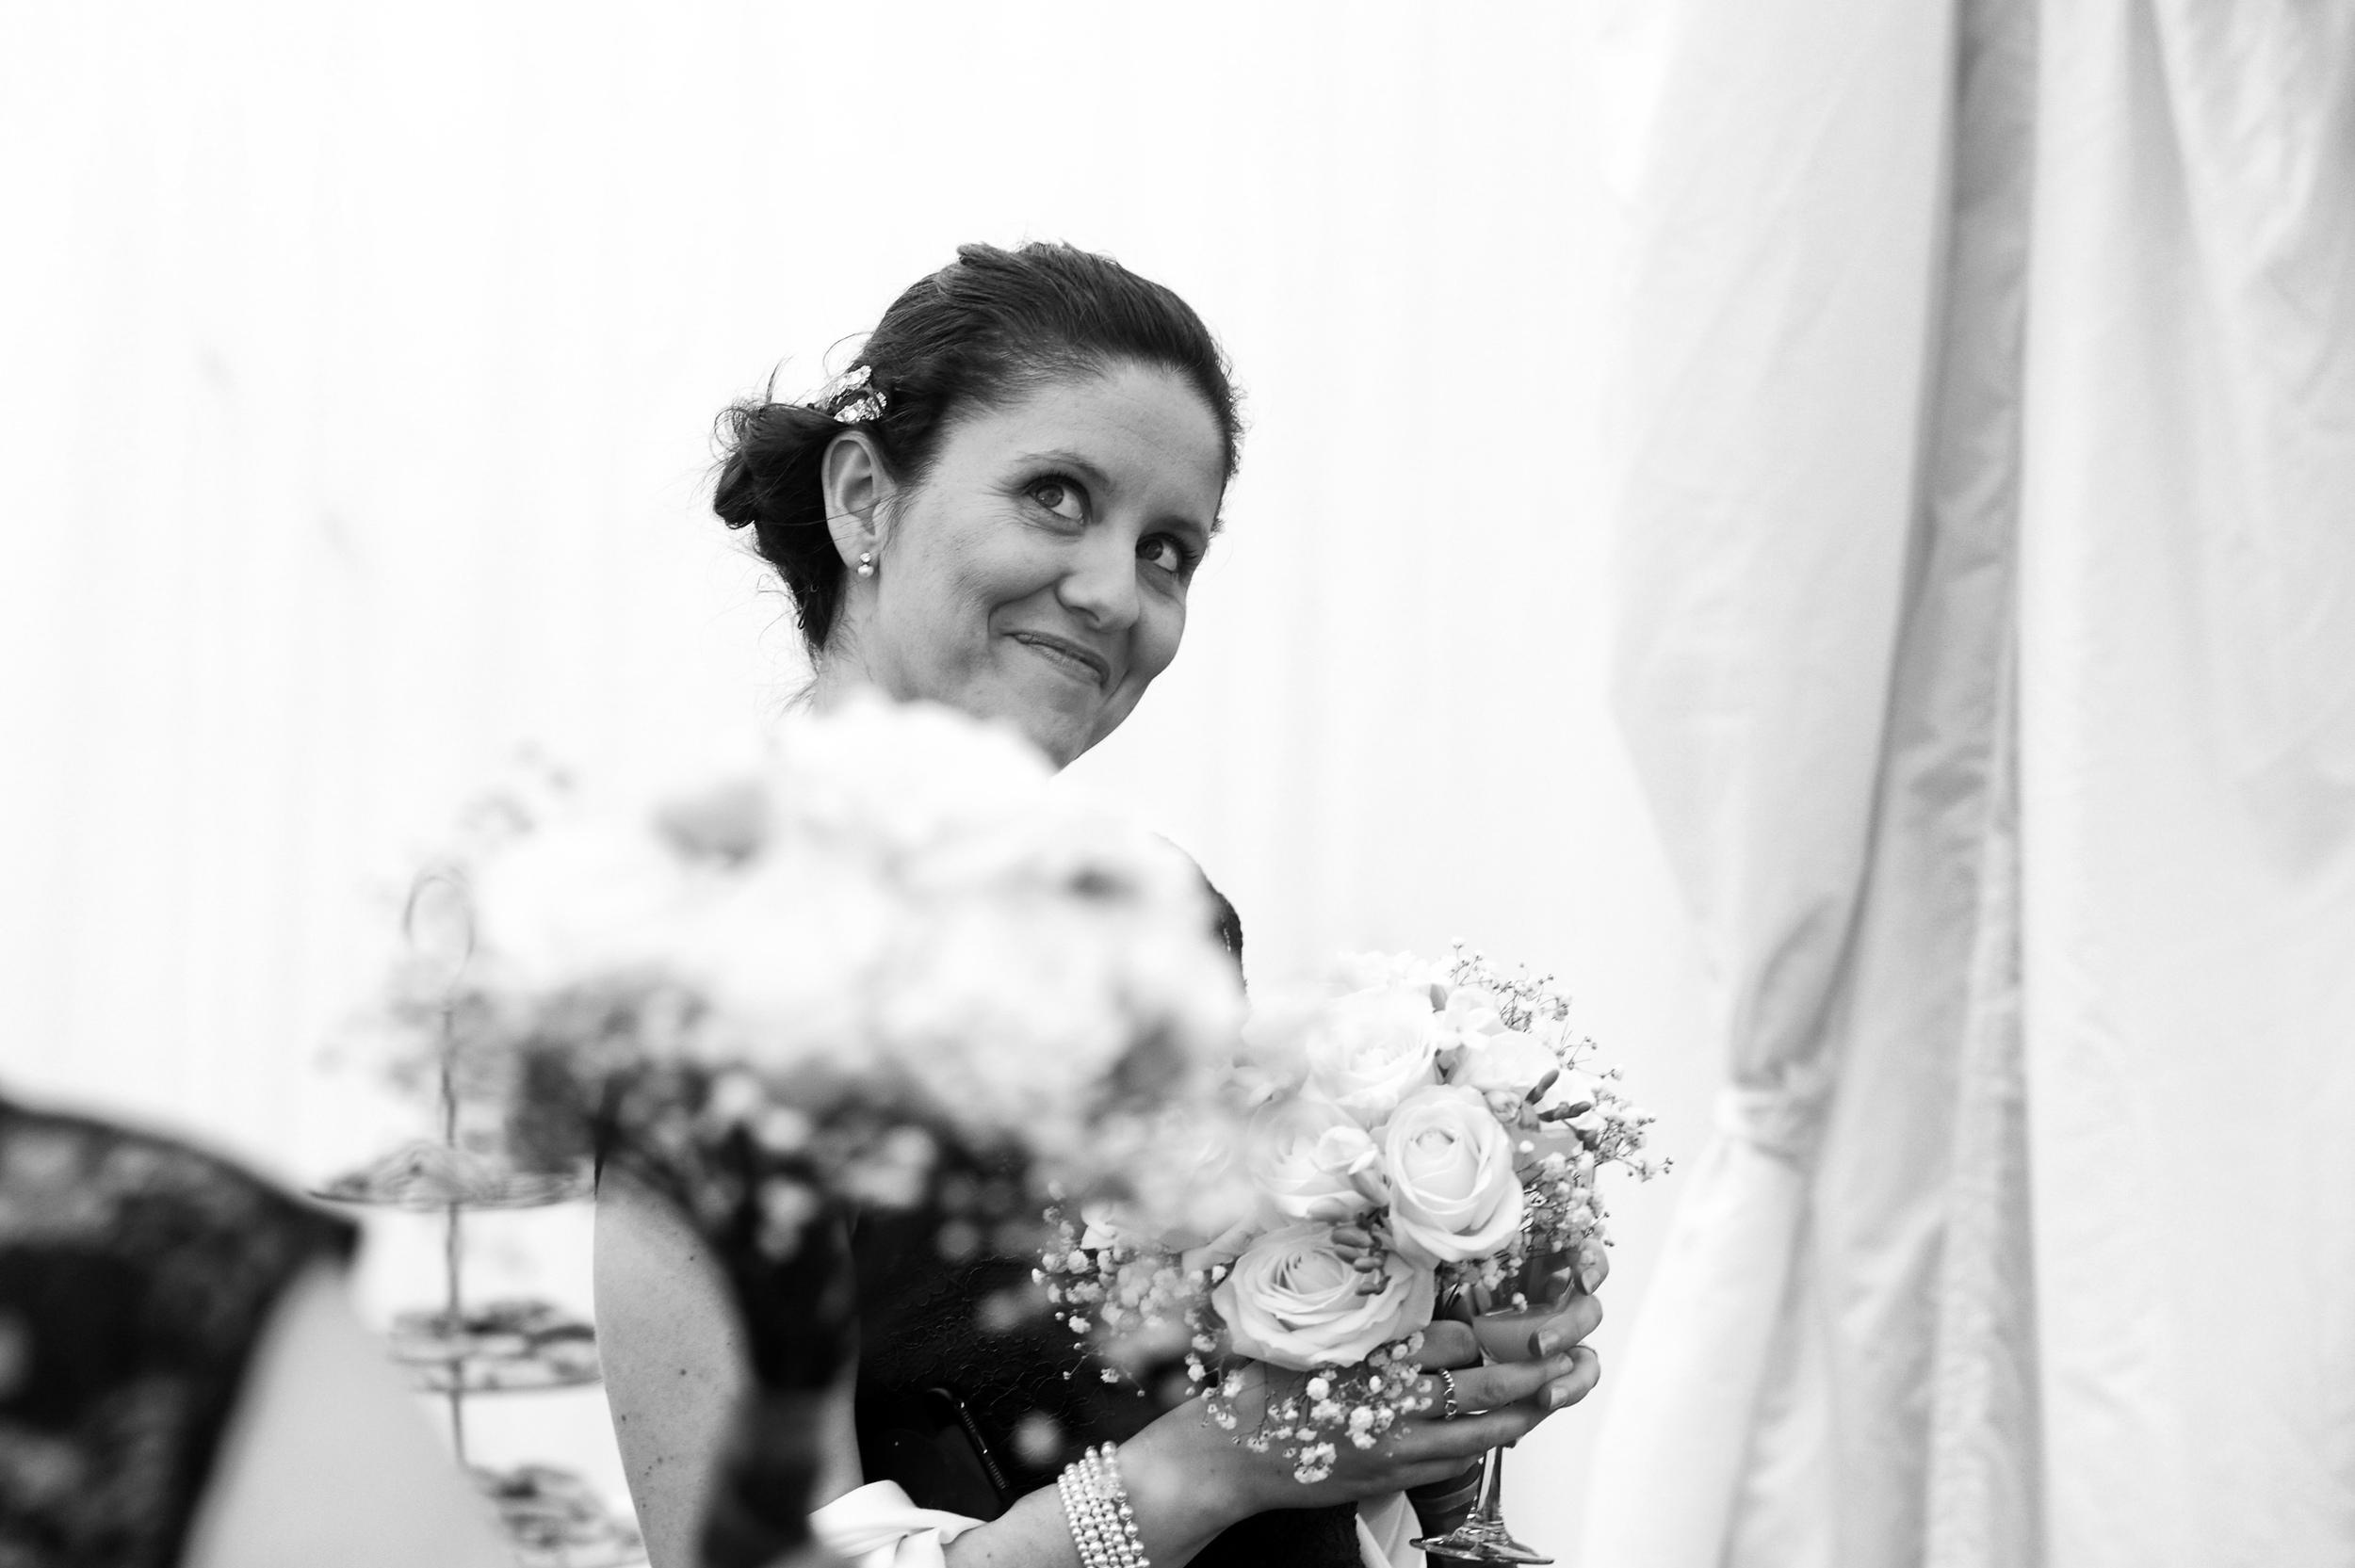 Ocean-View-Gower-Wedding-Photographer-041.JPG